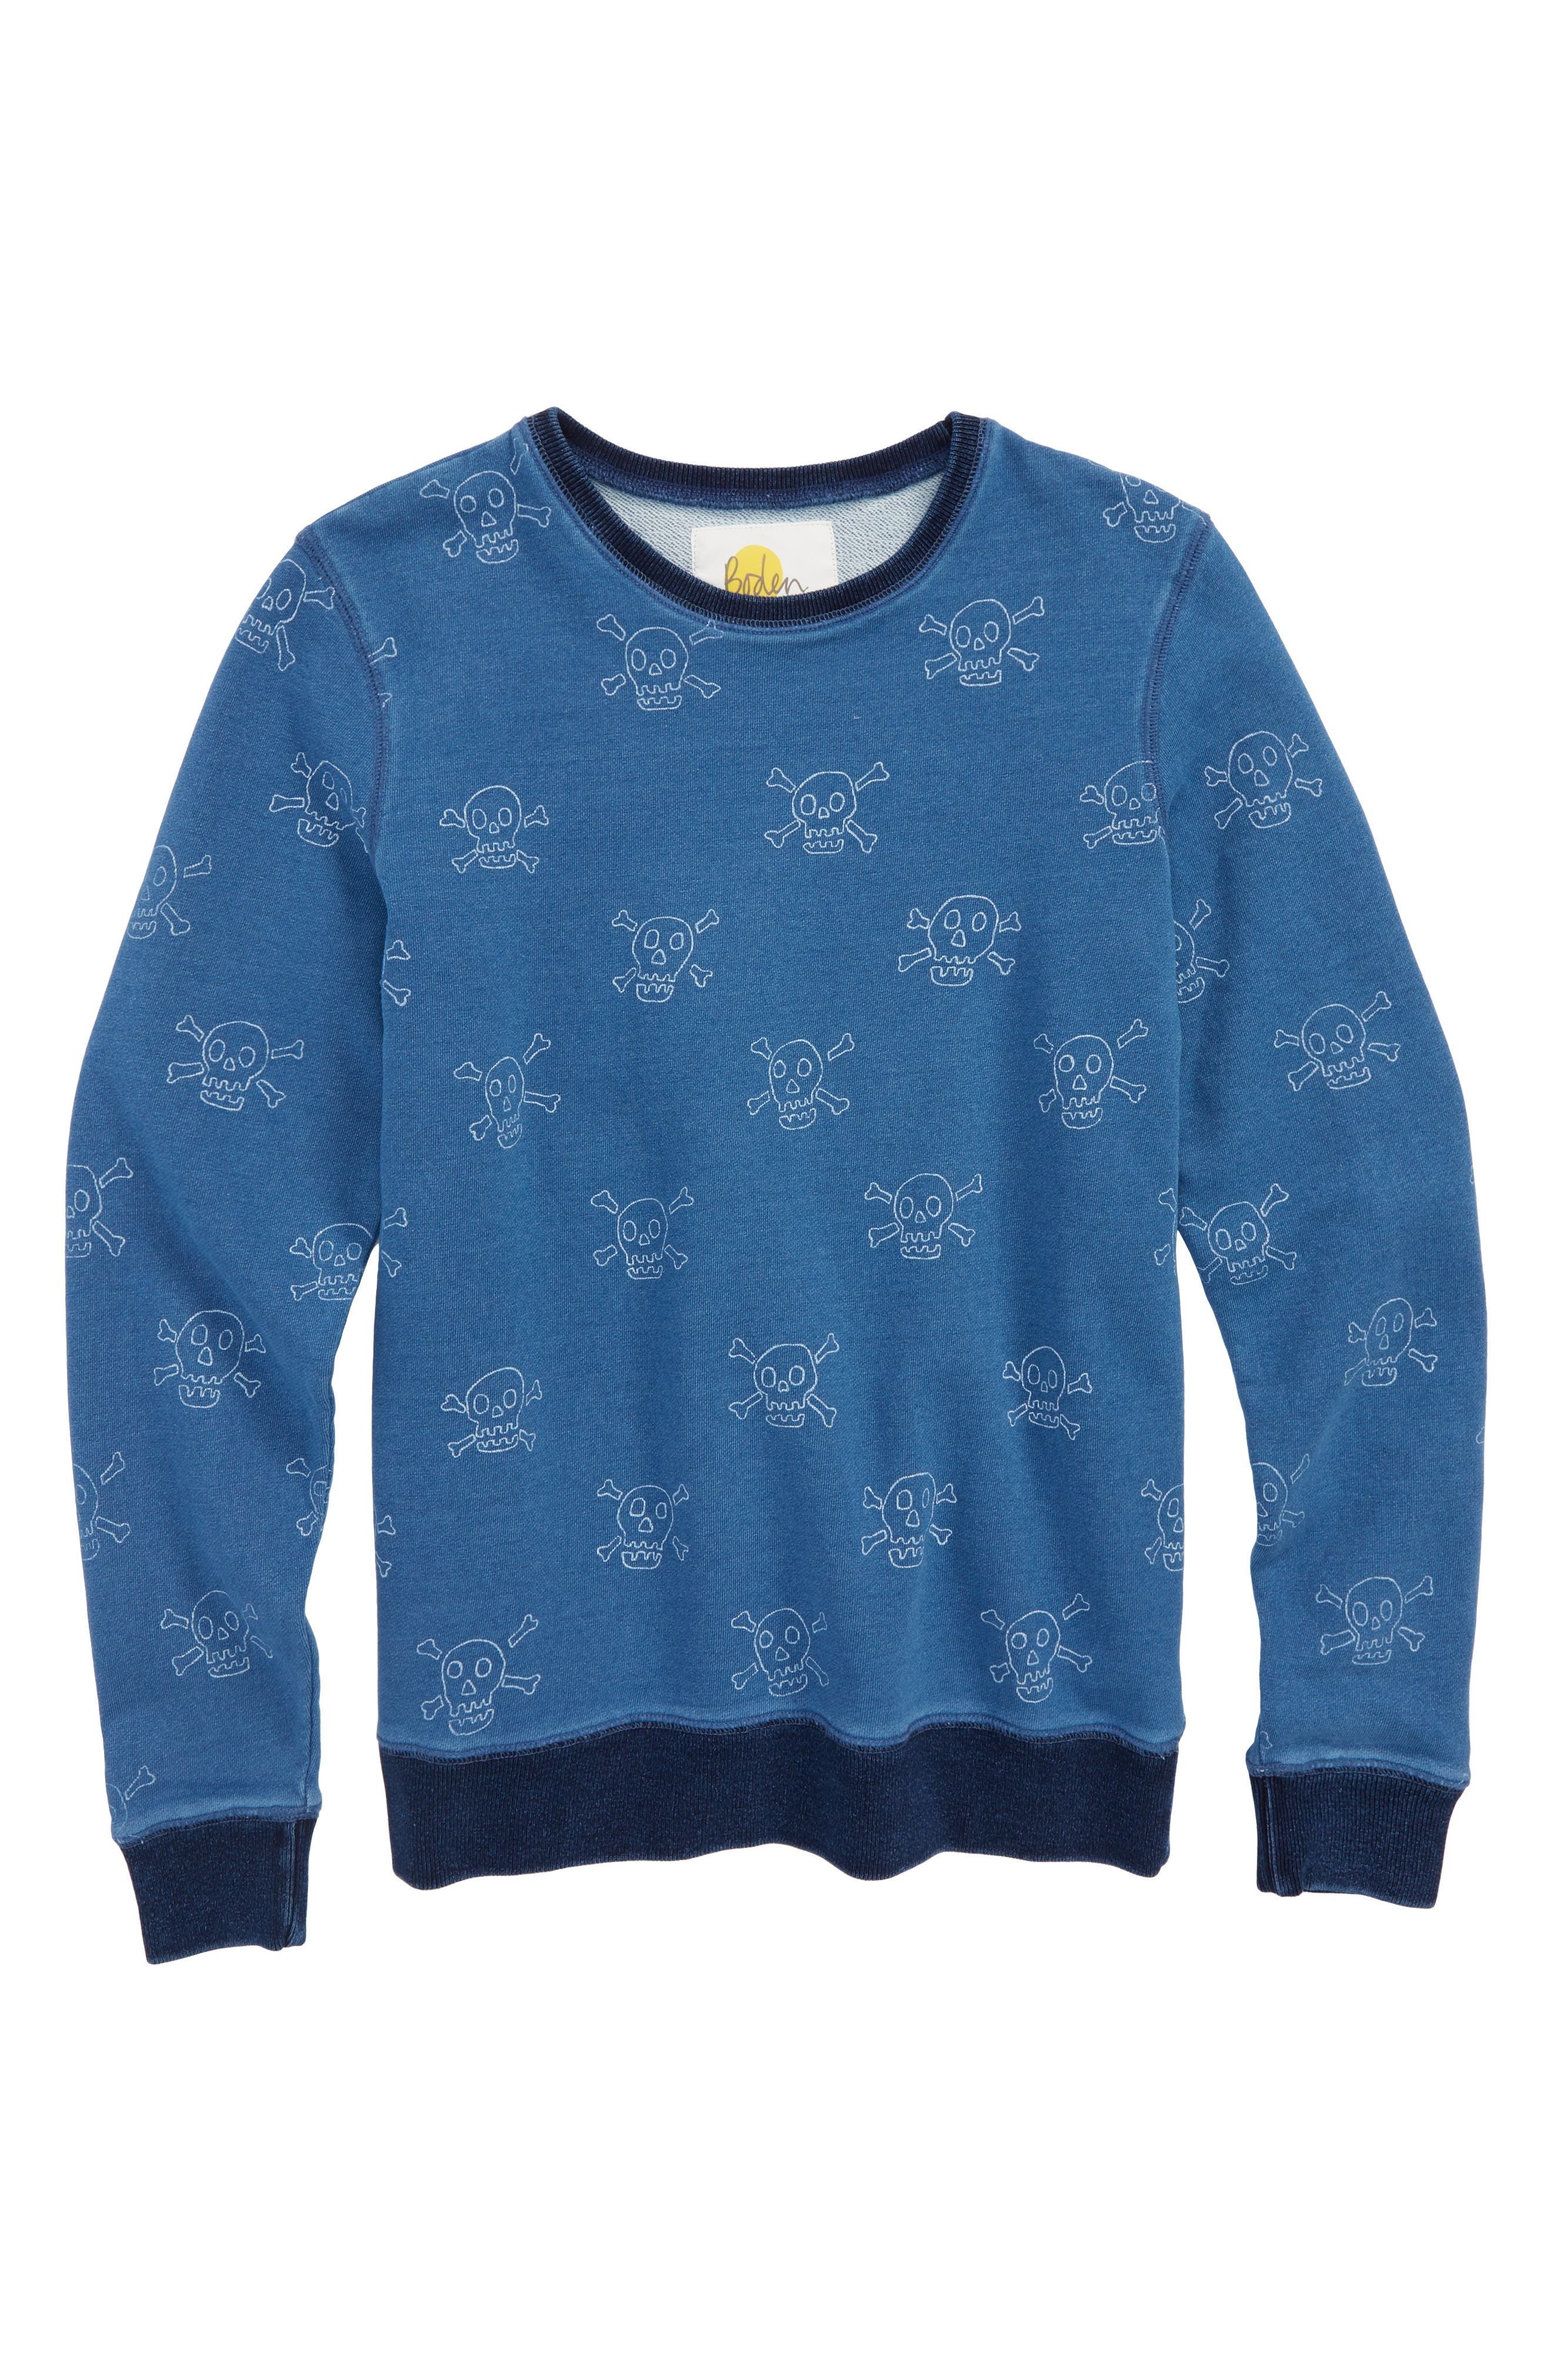 Castaway Skulls Sweatshirt,                         Main,                         color, 424